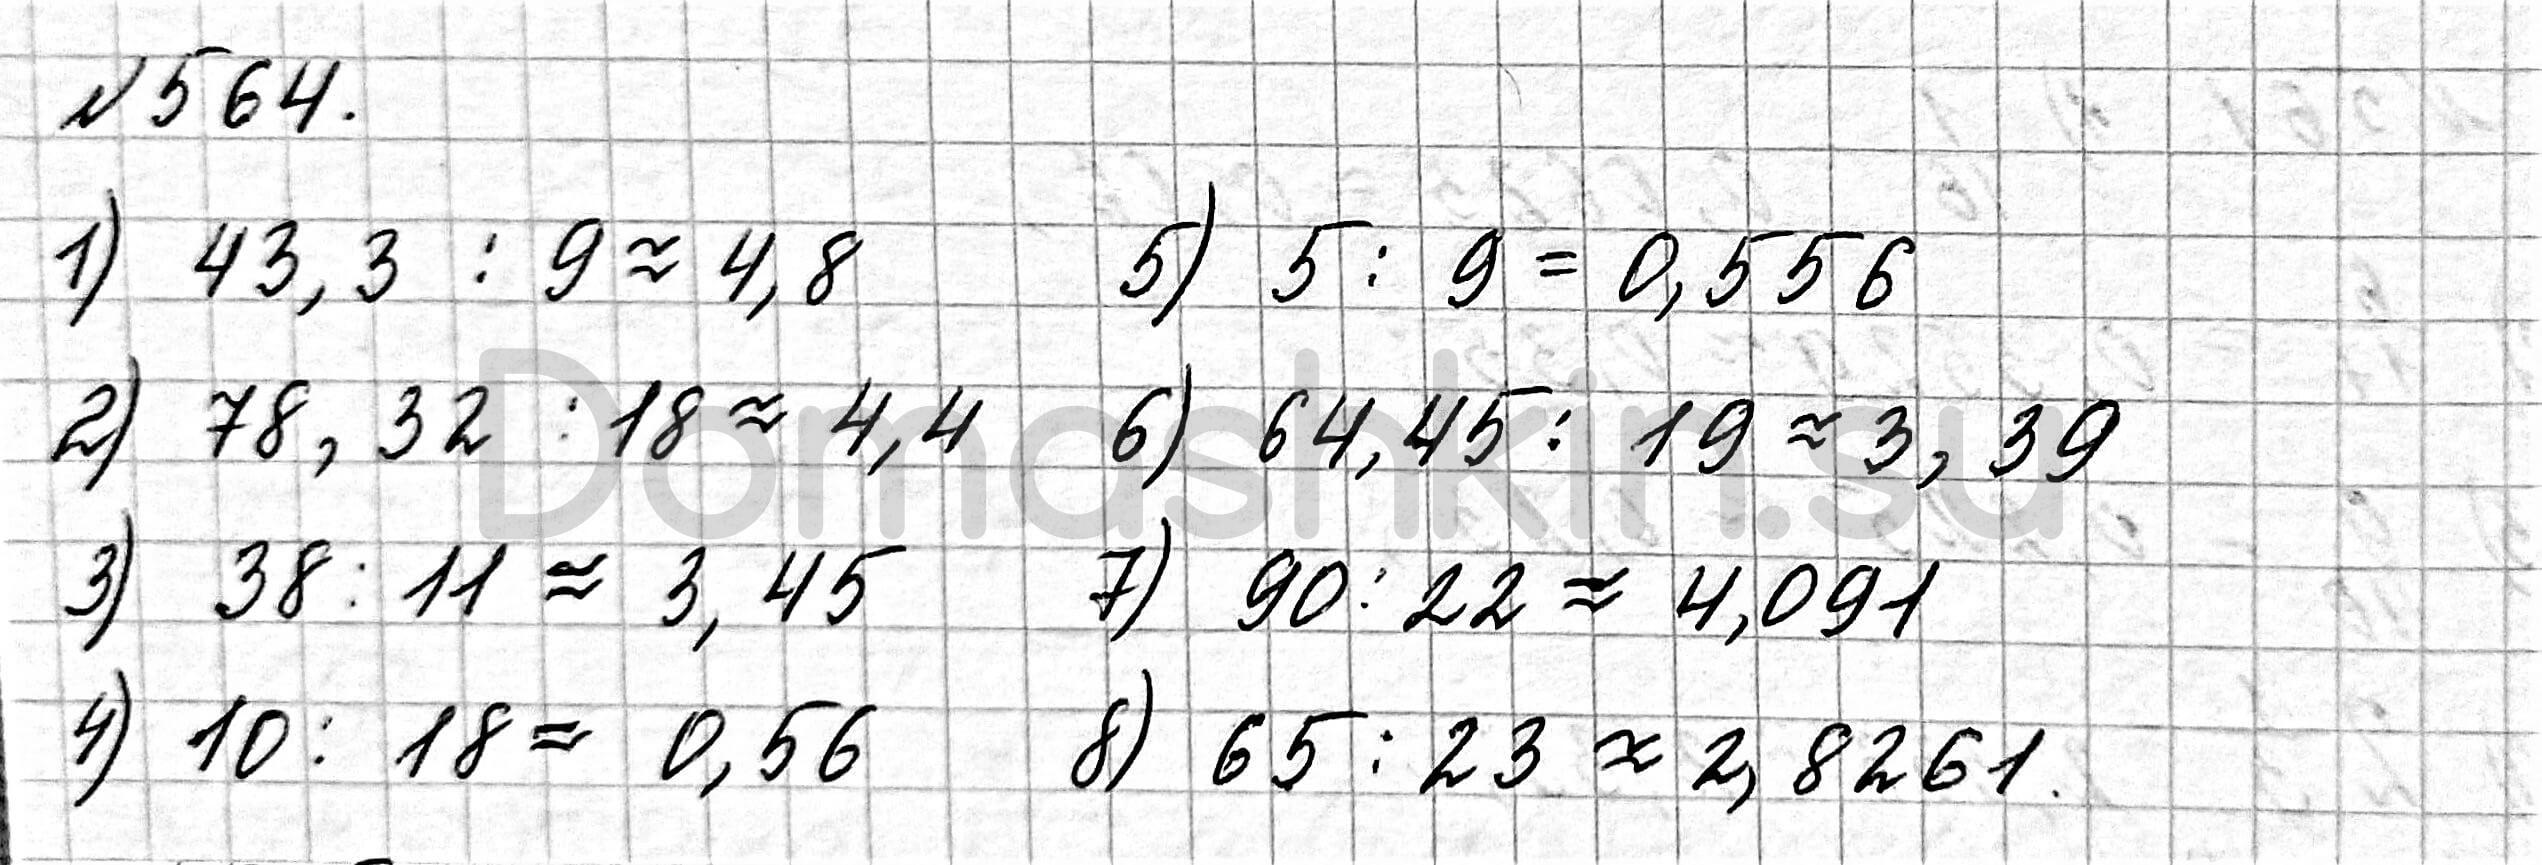 Математика 6 класс учебник Мерзляк номер 564 решение